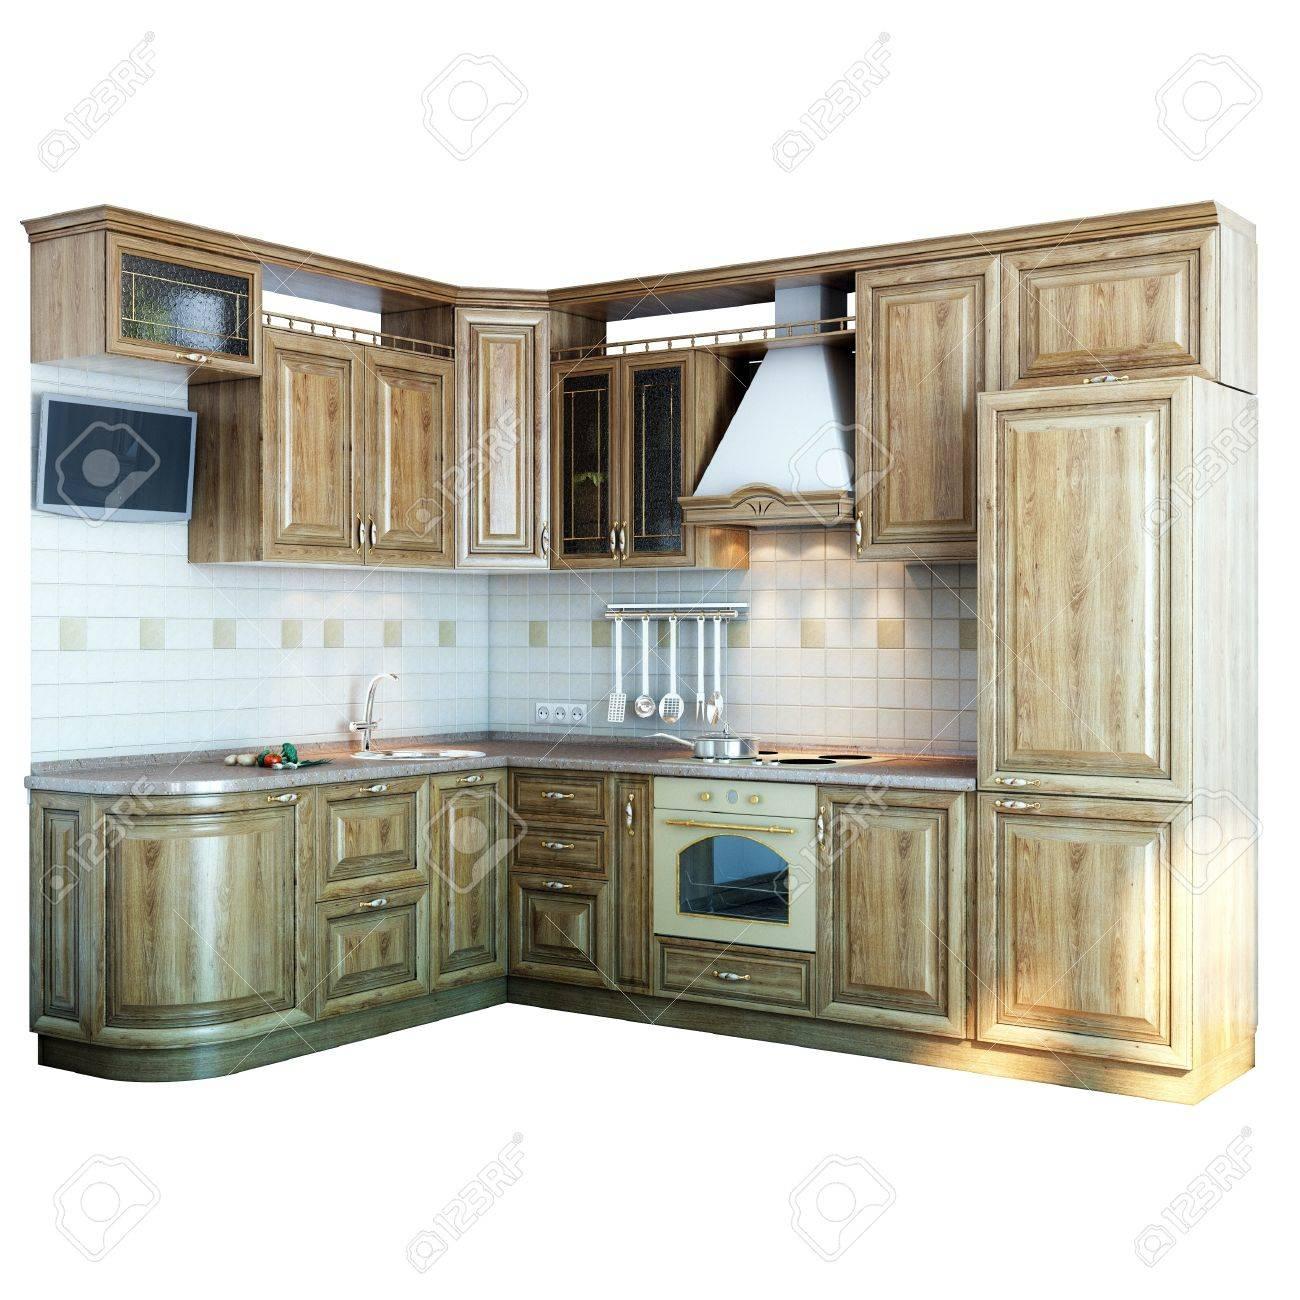 wood kitchen closeup  isolated on white version  Stock Photo - 14260187